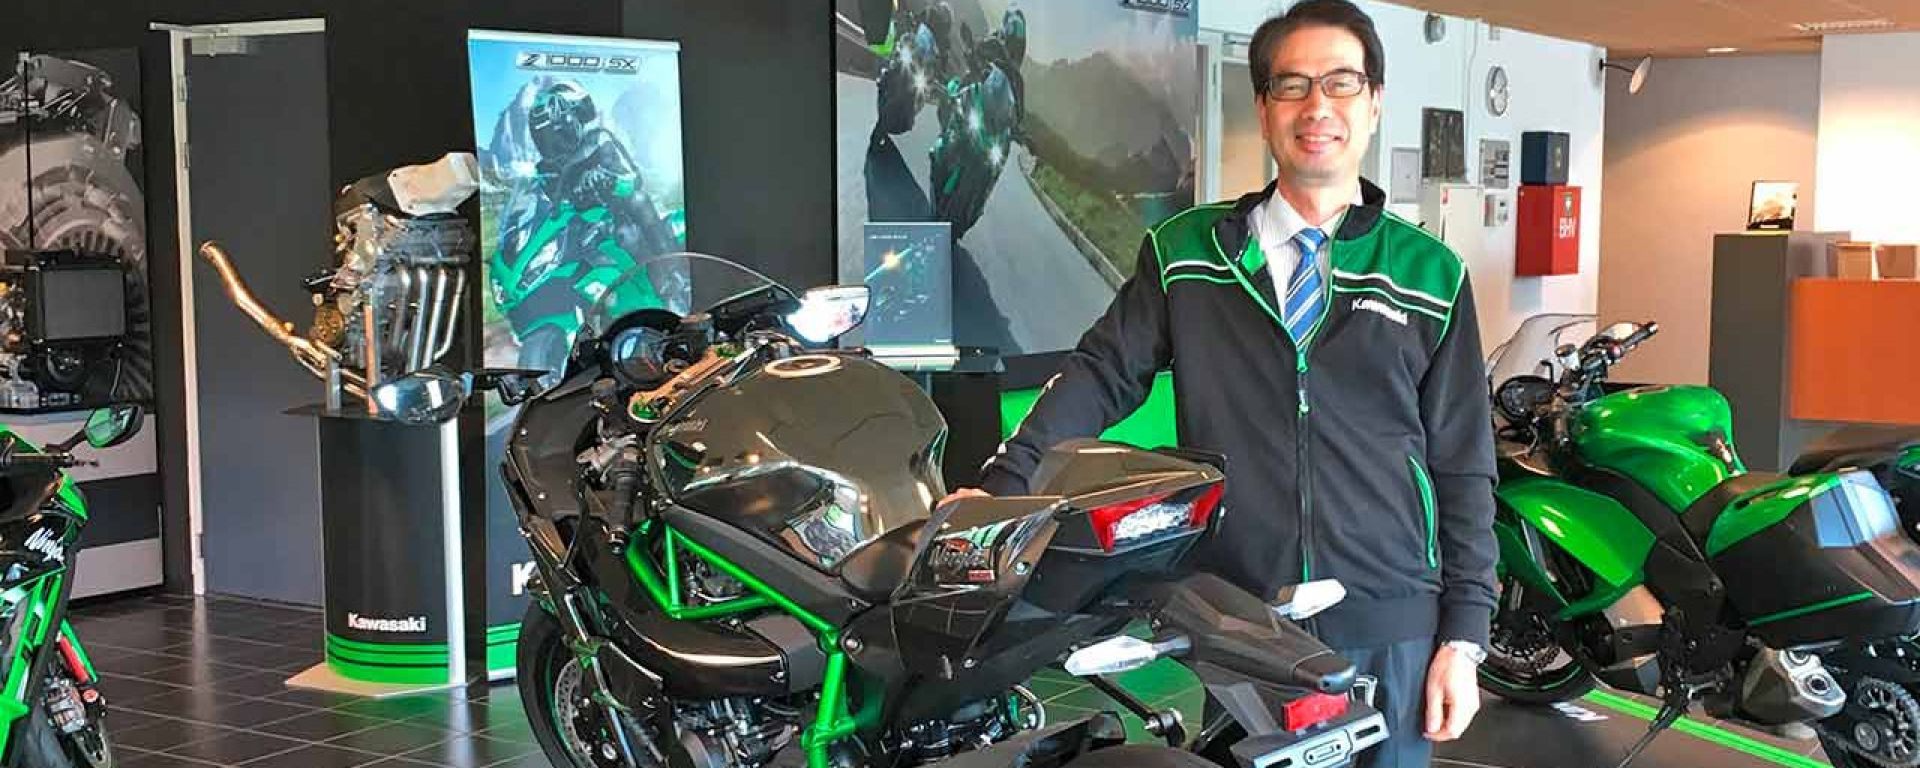 Crisi microchip Kawasaki: le parole del capo di Kawasaki Motors Europe